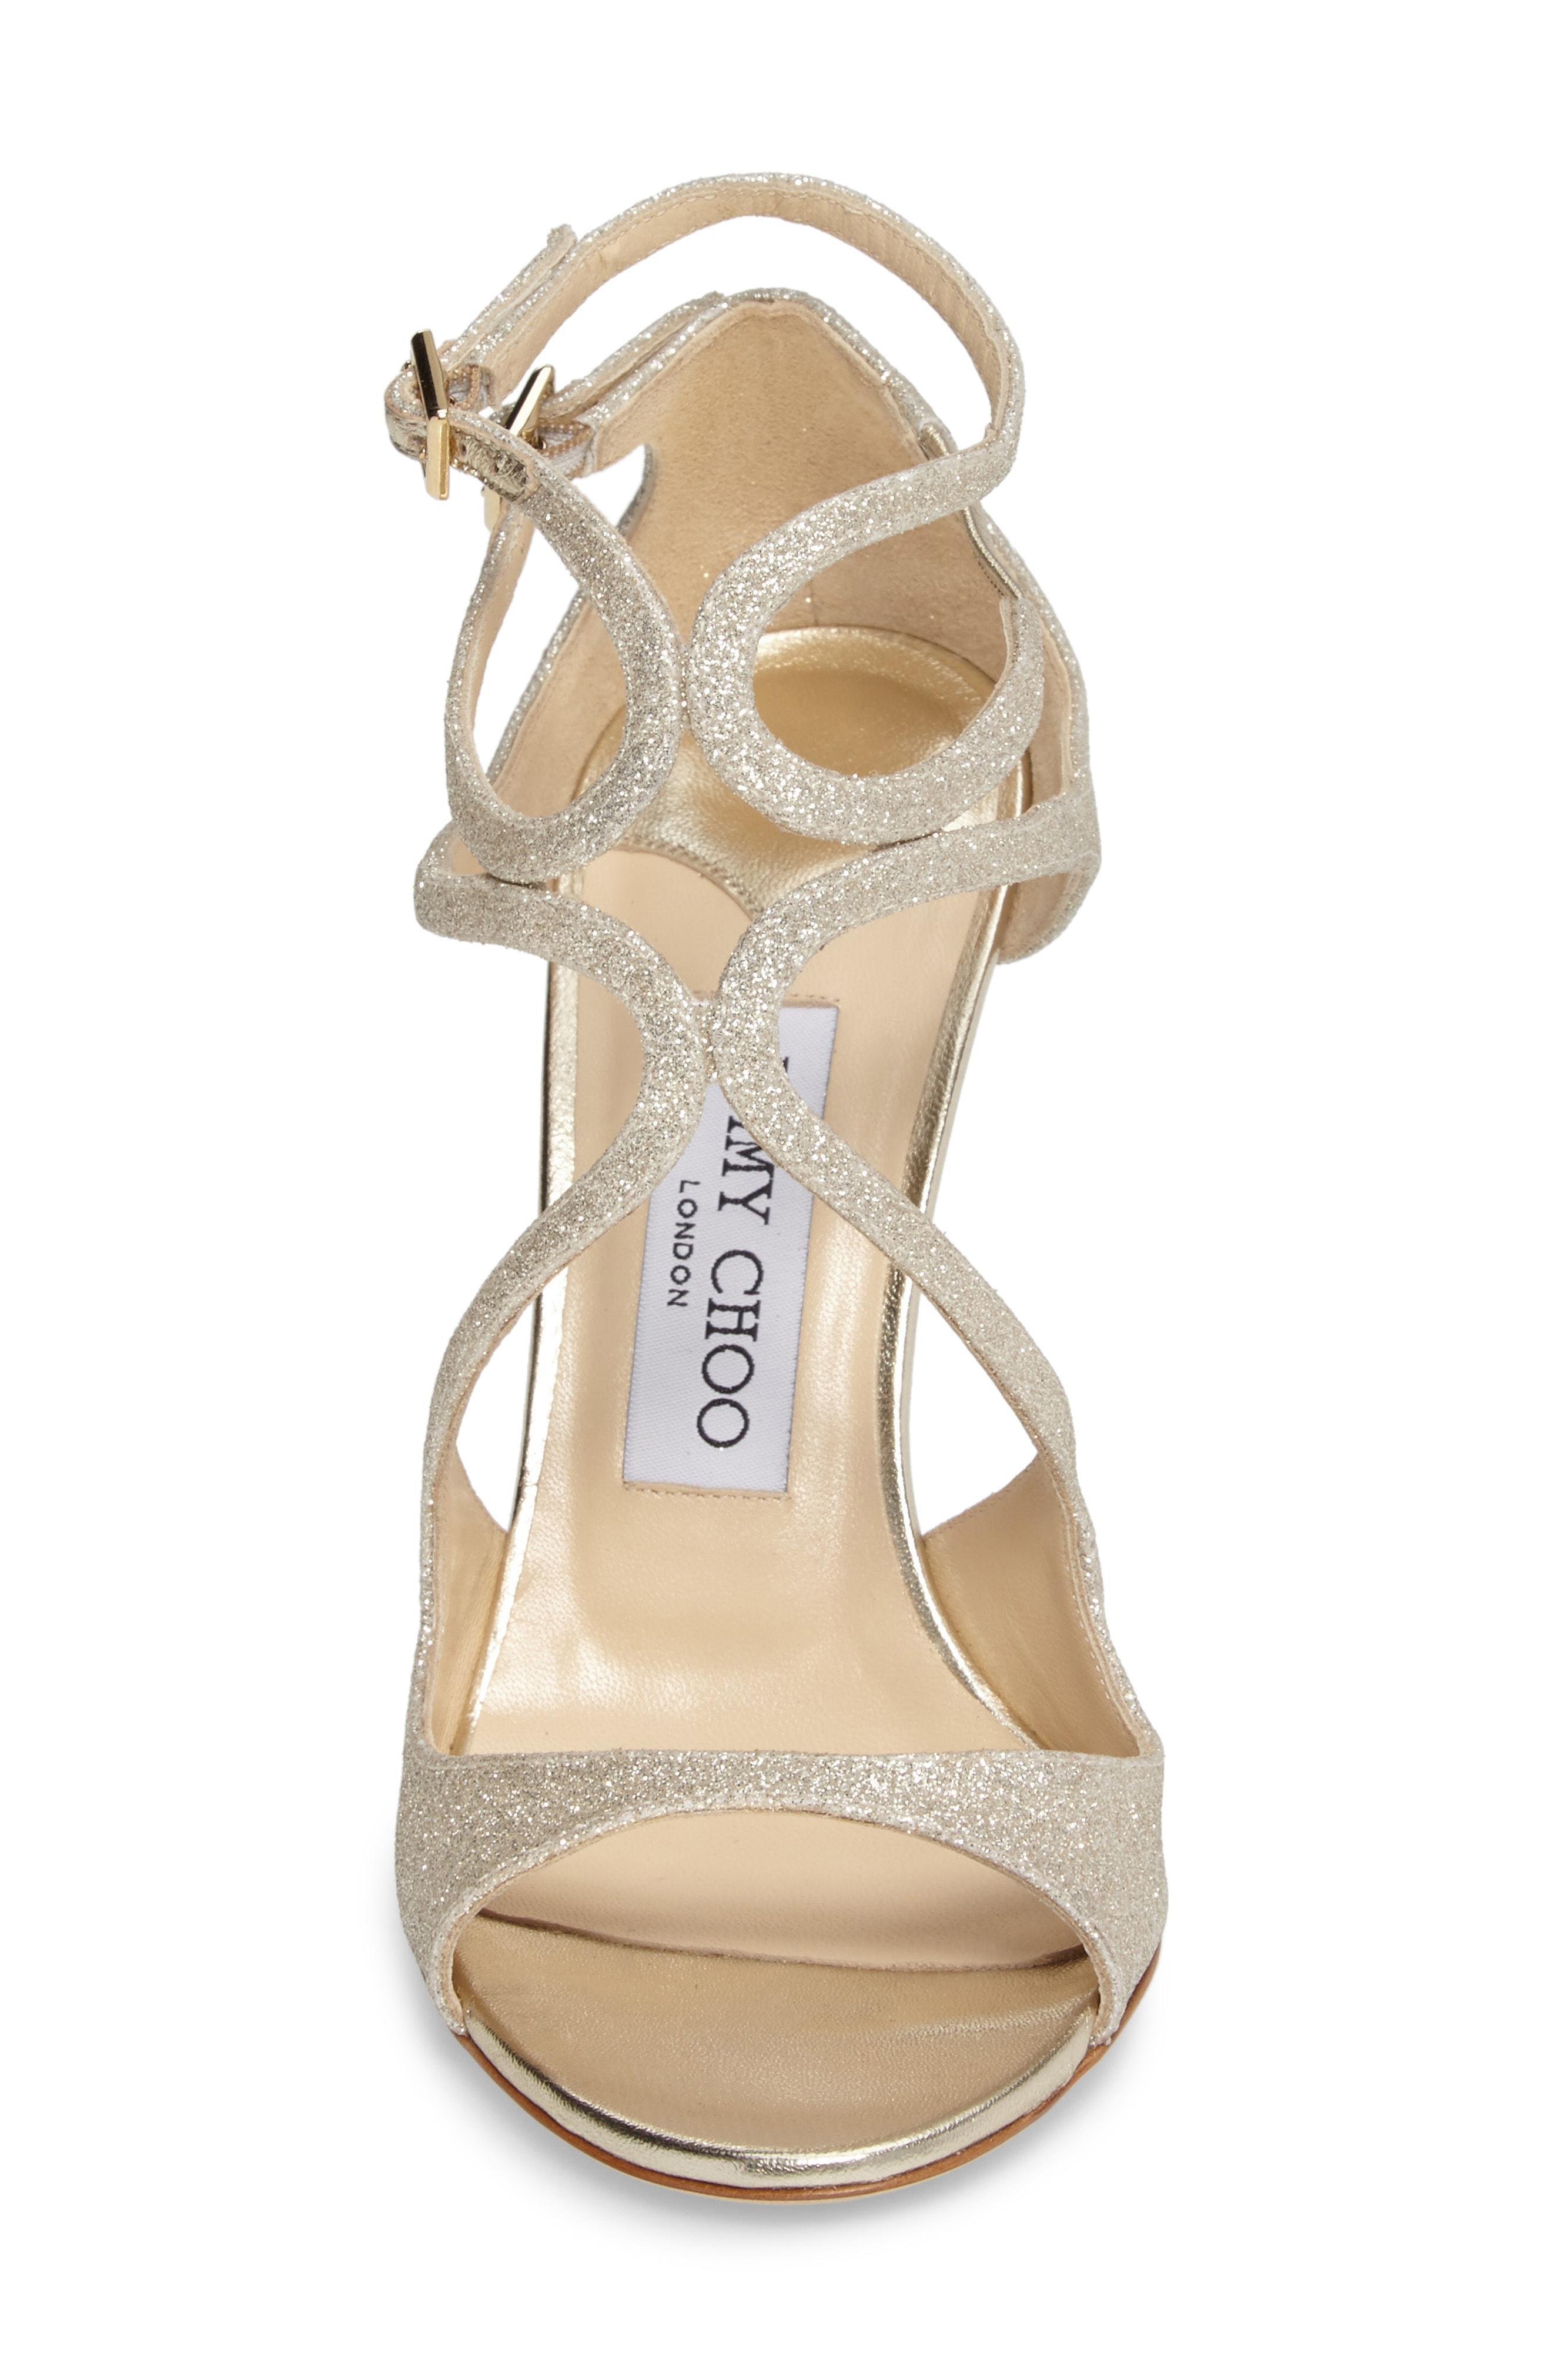 90892293cef Jimmy Choo 100Mm Lang Dusty Glitter Sandals